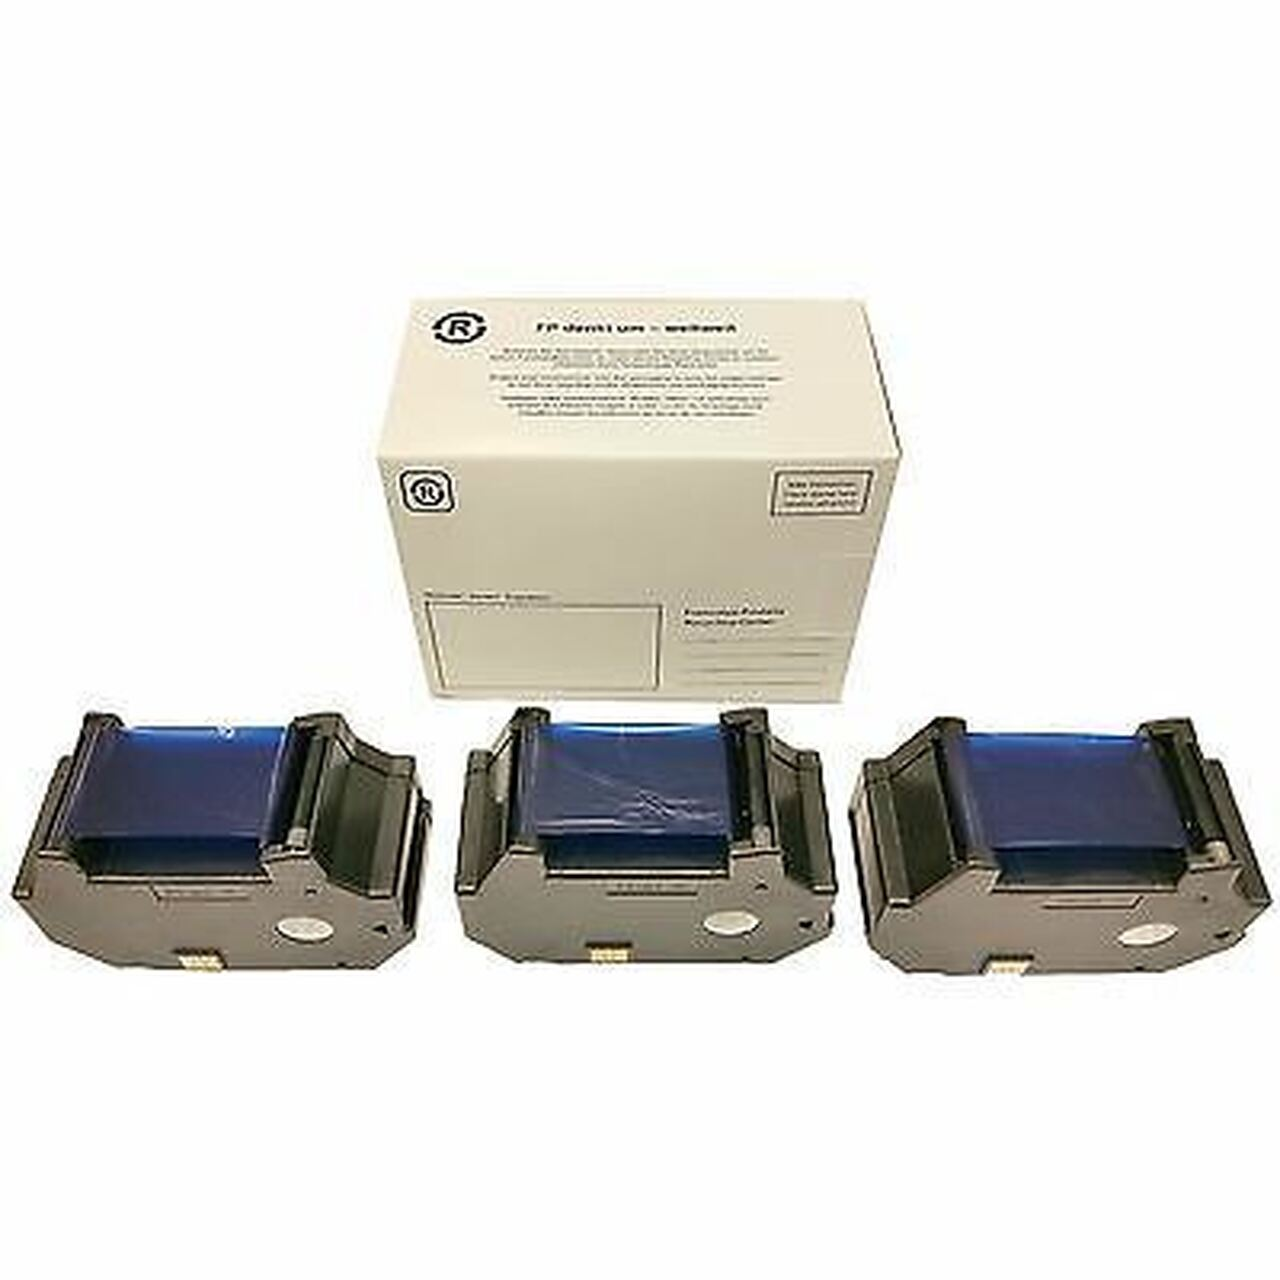 Original Francotyp Postalia FP OptiMail 30 Franking Ink Cartridge - 3 Pack